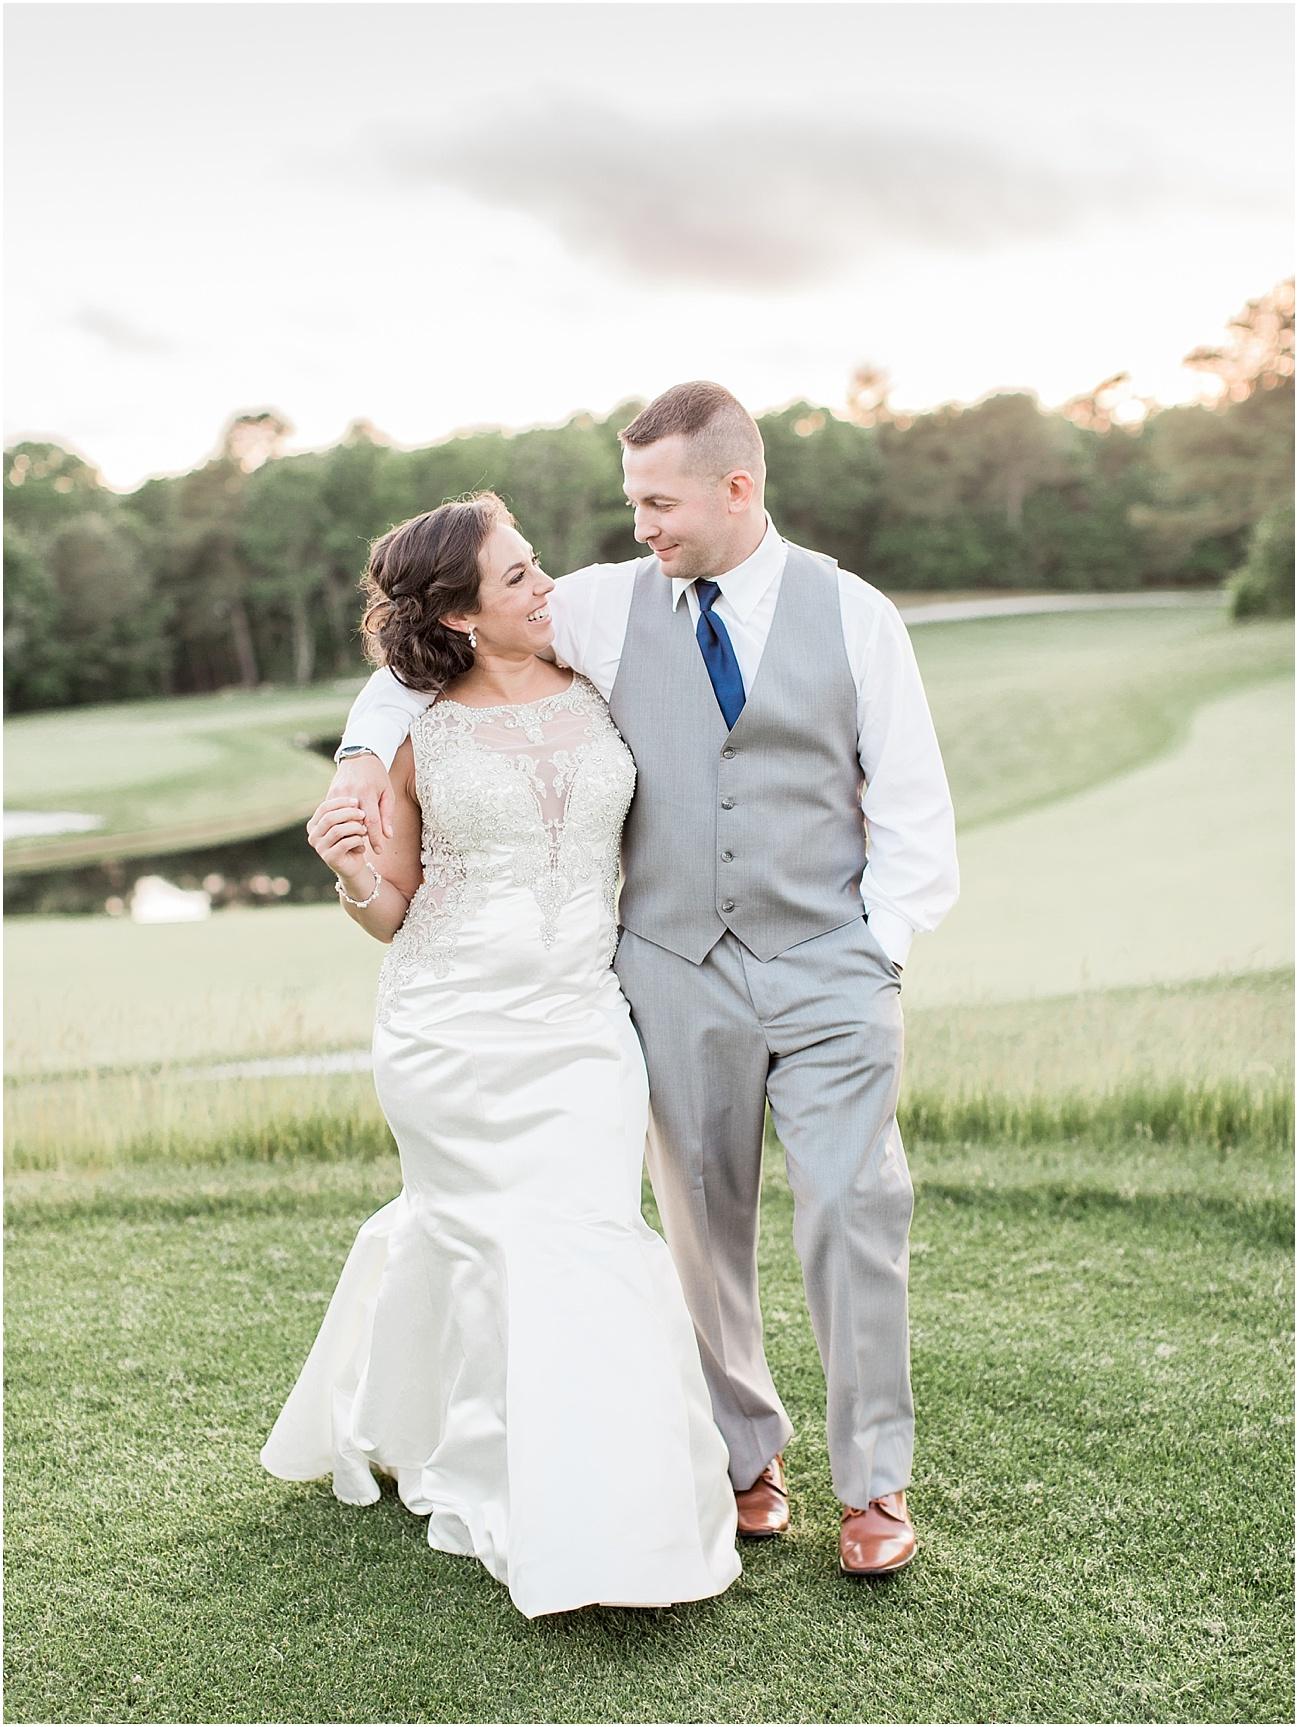 nicole_stephen_cape_club_nicky_falmouth_cod_boston_wedding_photographer_meredith_jane_photography_photo_0198.jpg